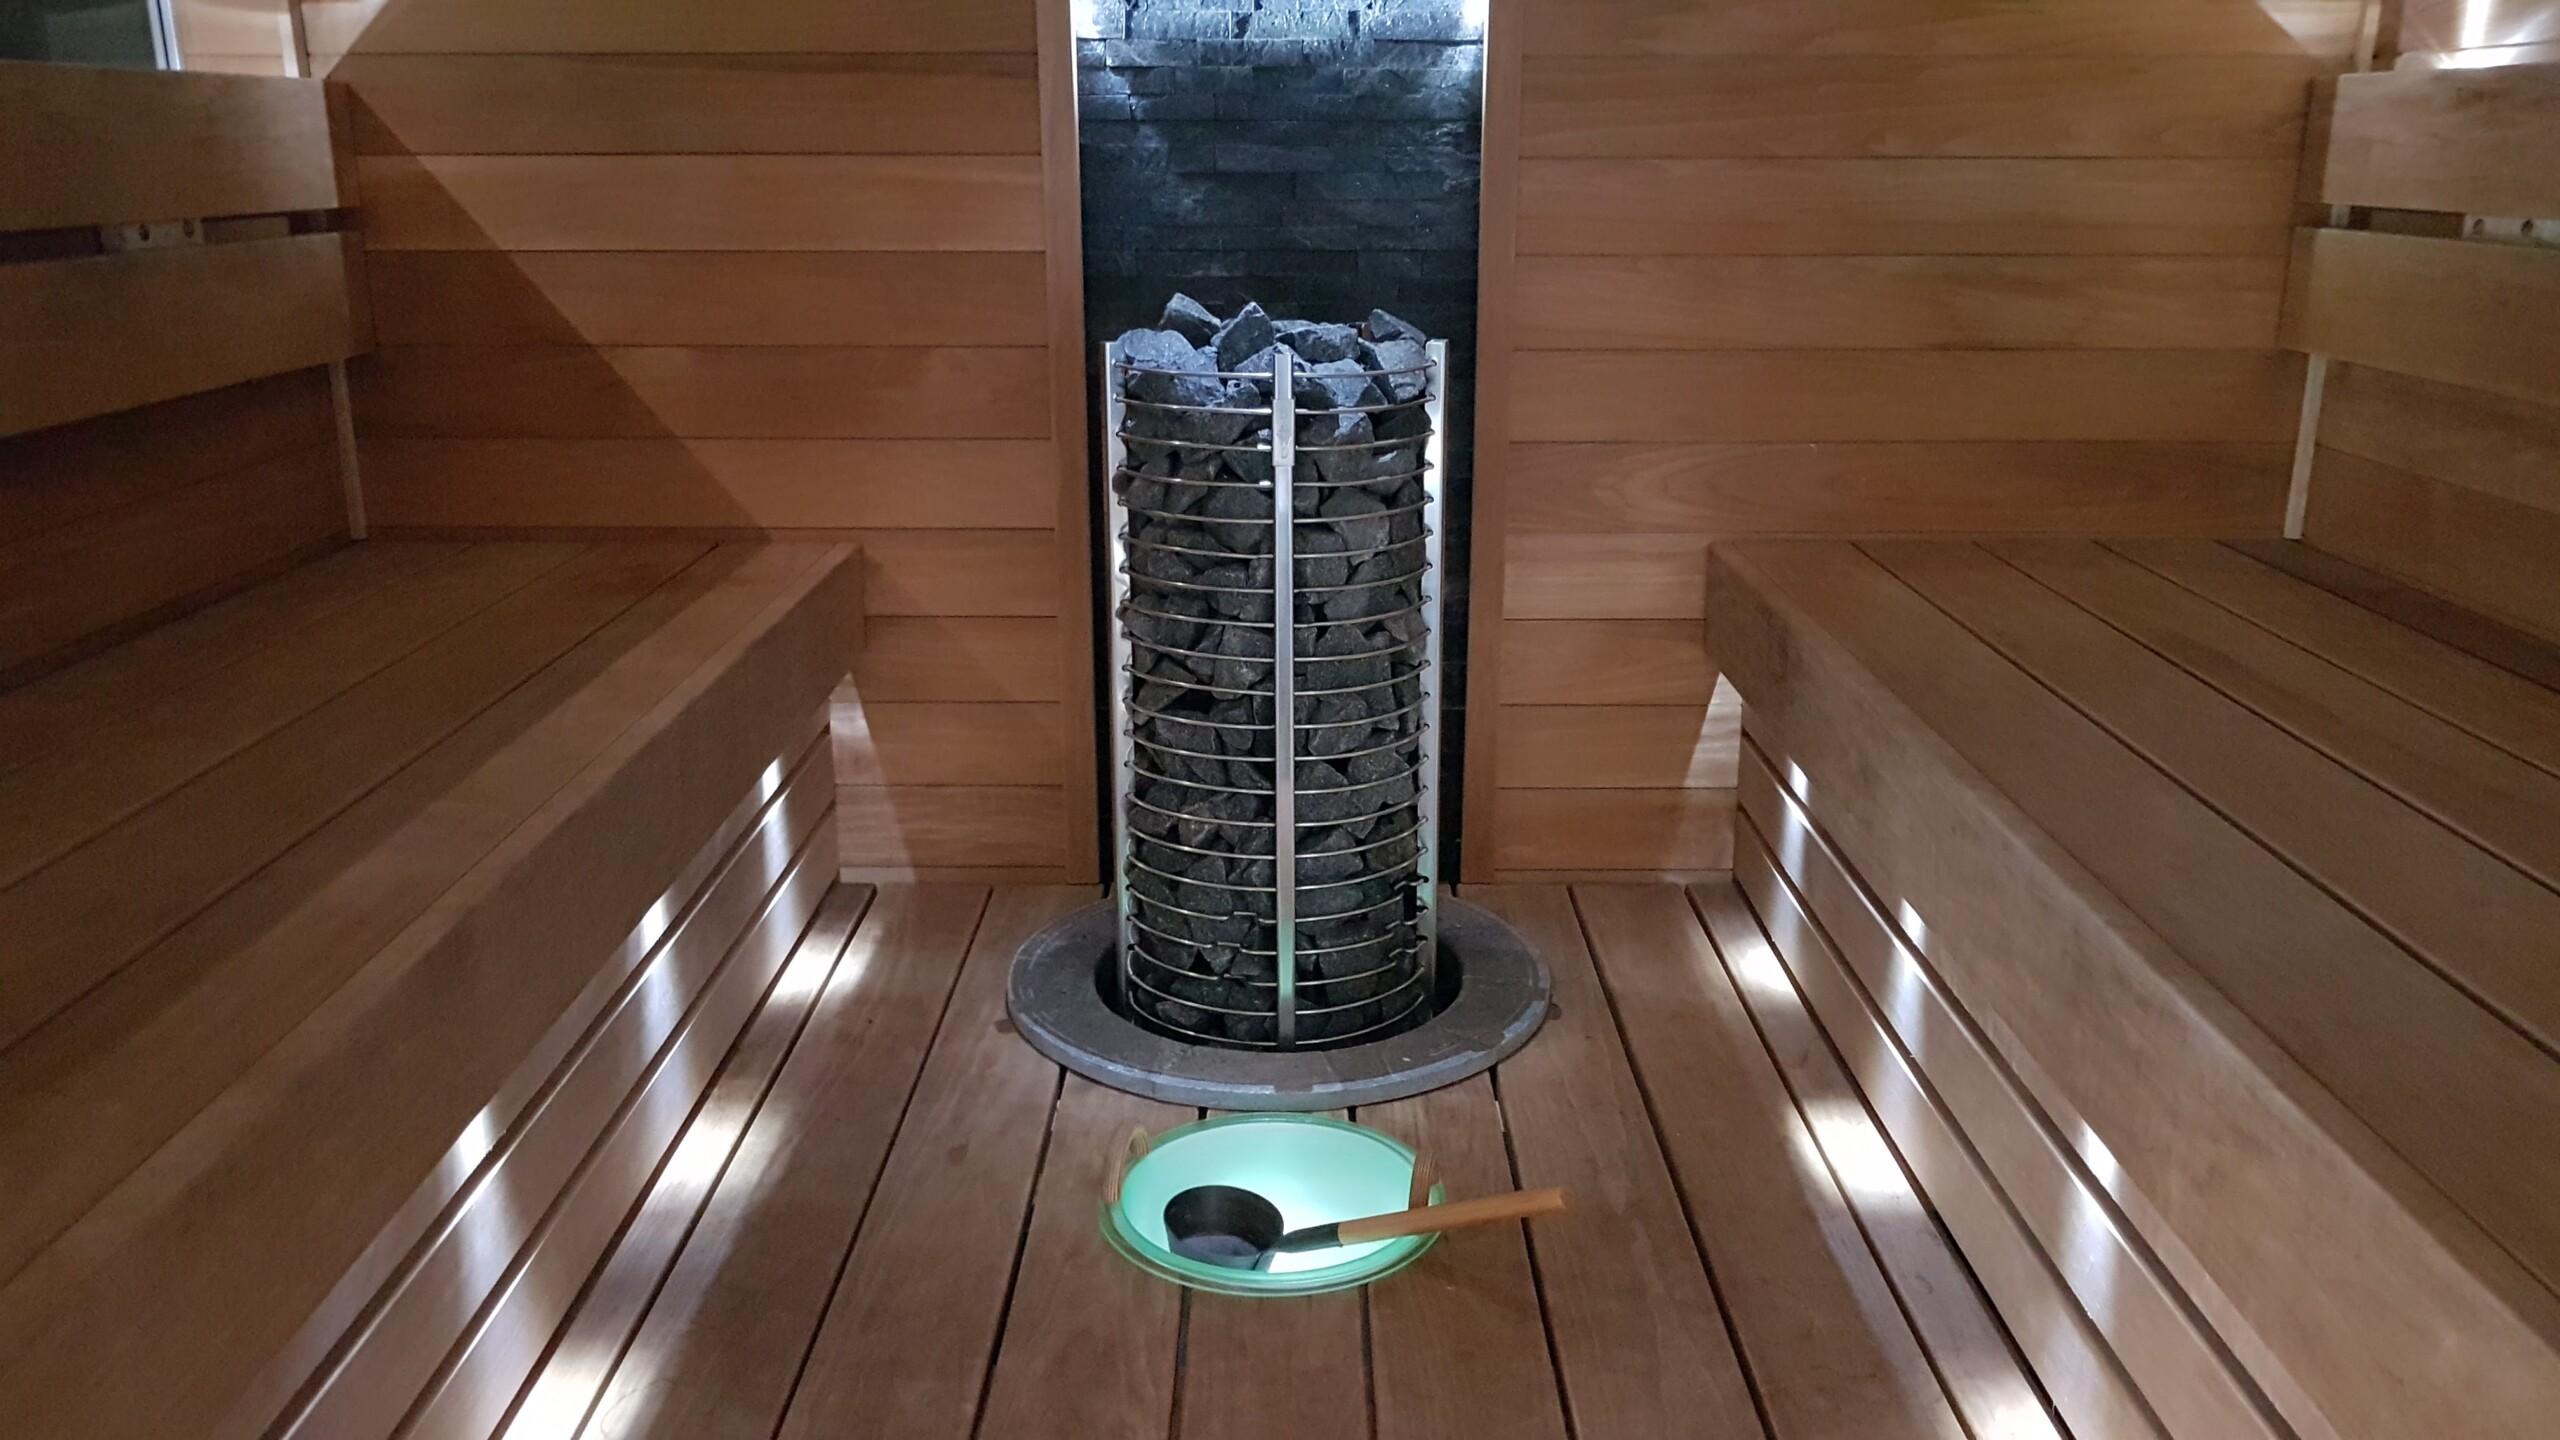 sauna ehitus, saunade ehitus, ehitame sauna, saunaehitaja, voodrilauad, lavalauad, saunalava